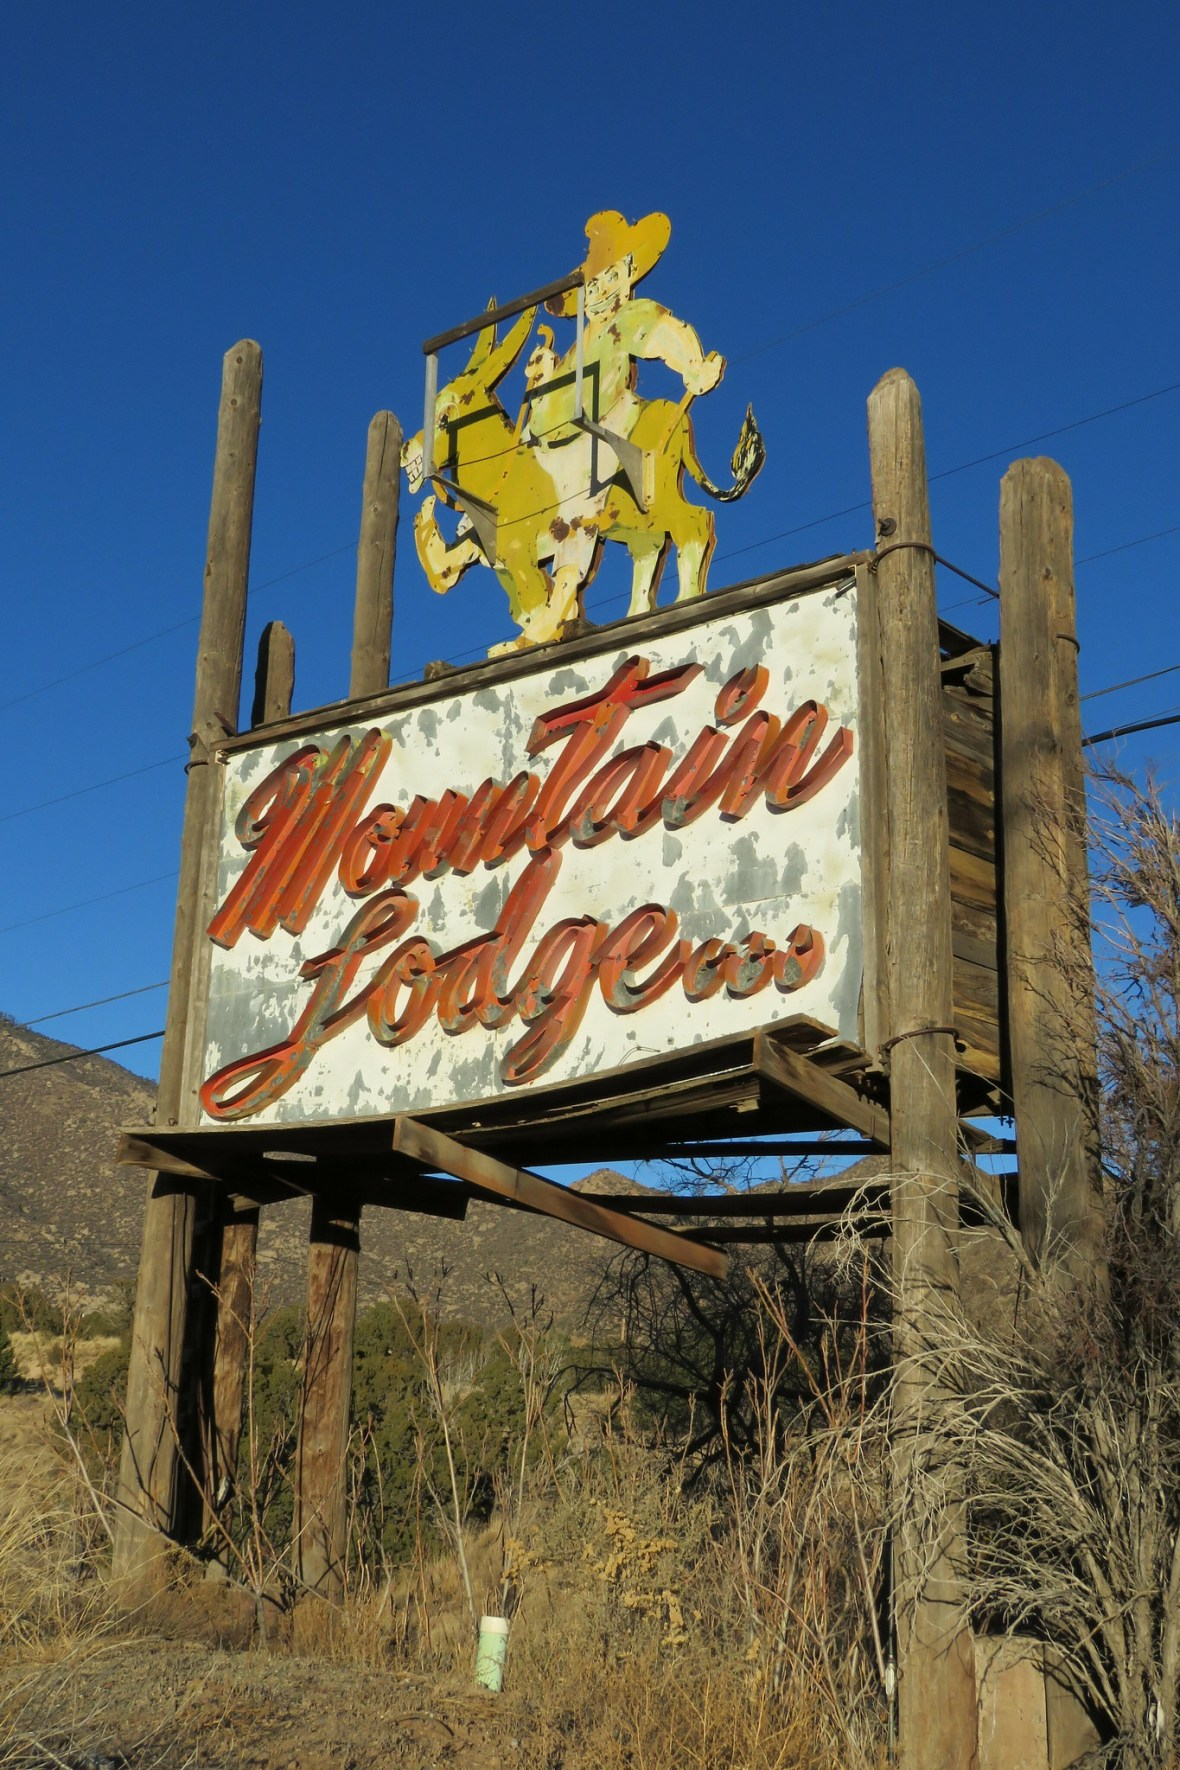 Mountain Lodge - Carnuel, New Mexico U.S.A. - January 14, 2018